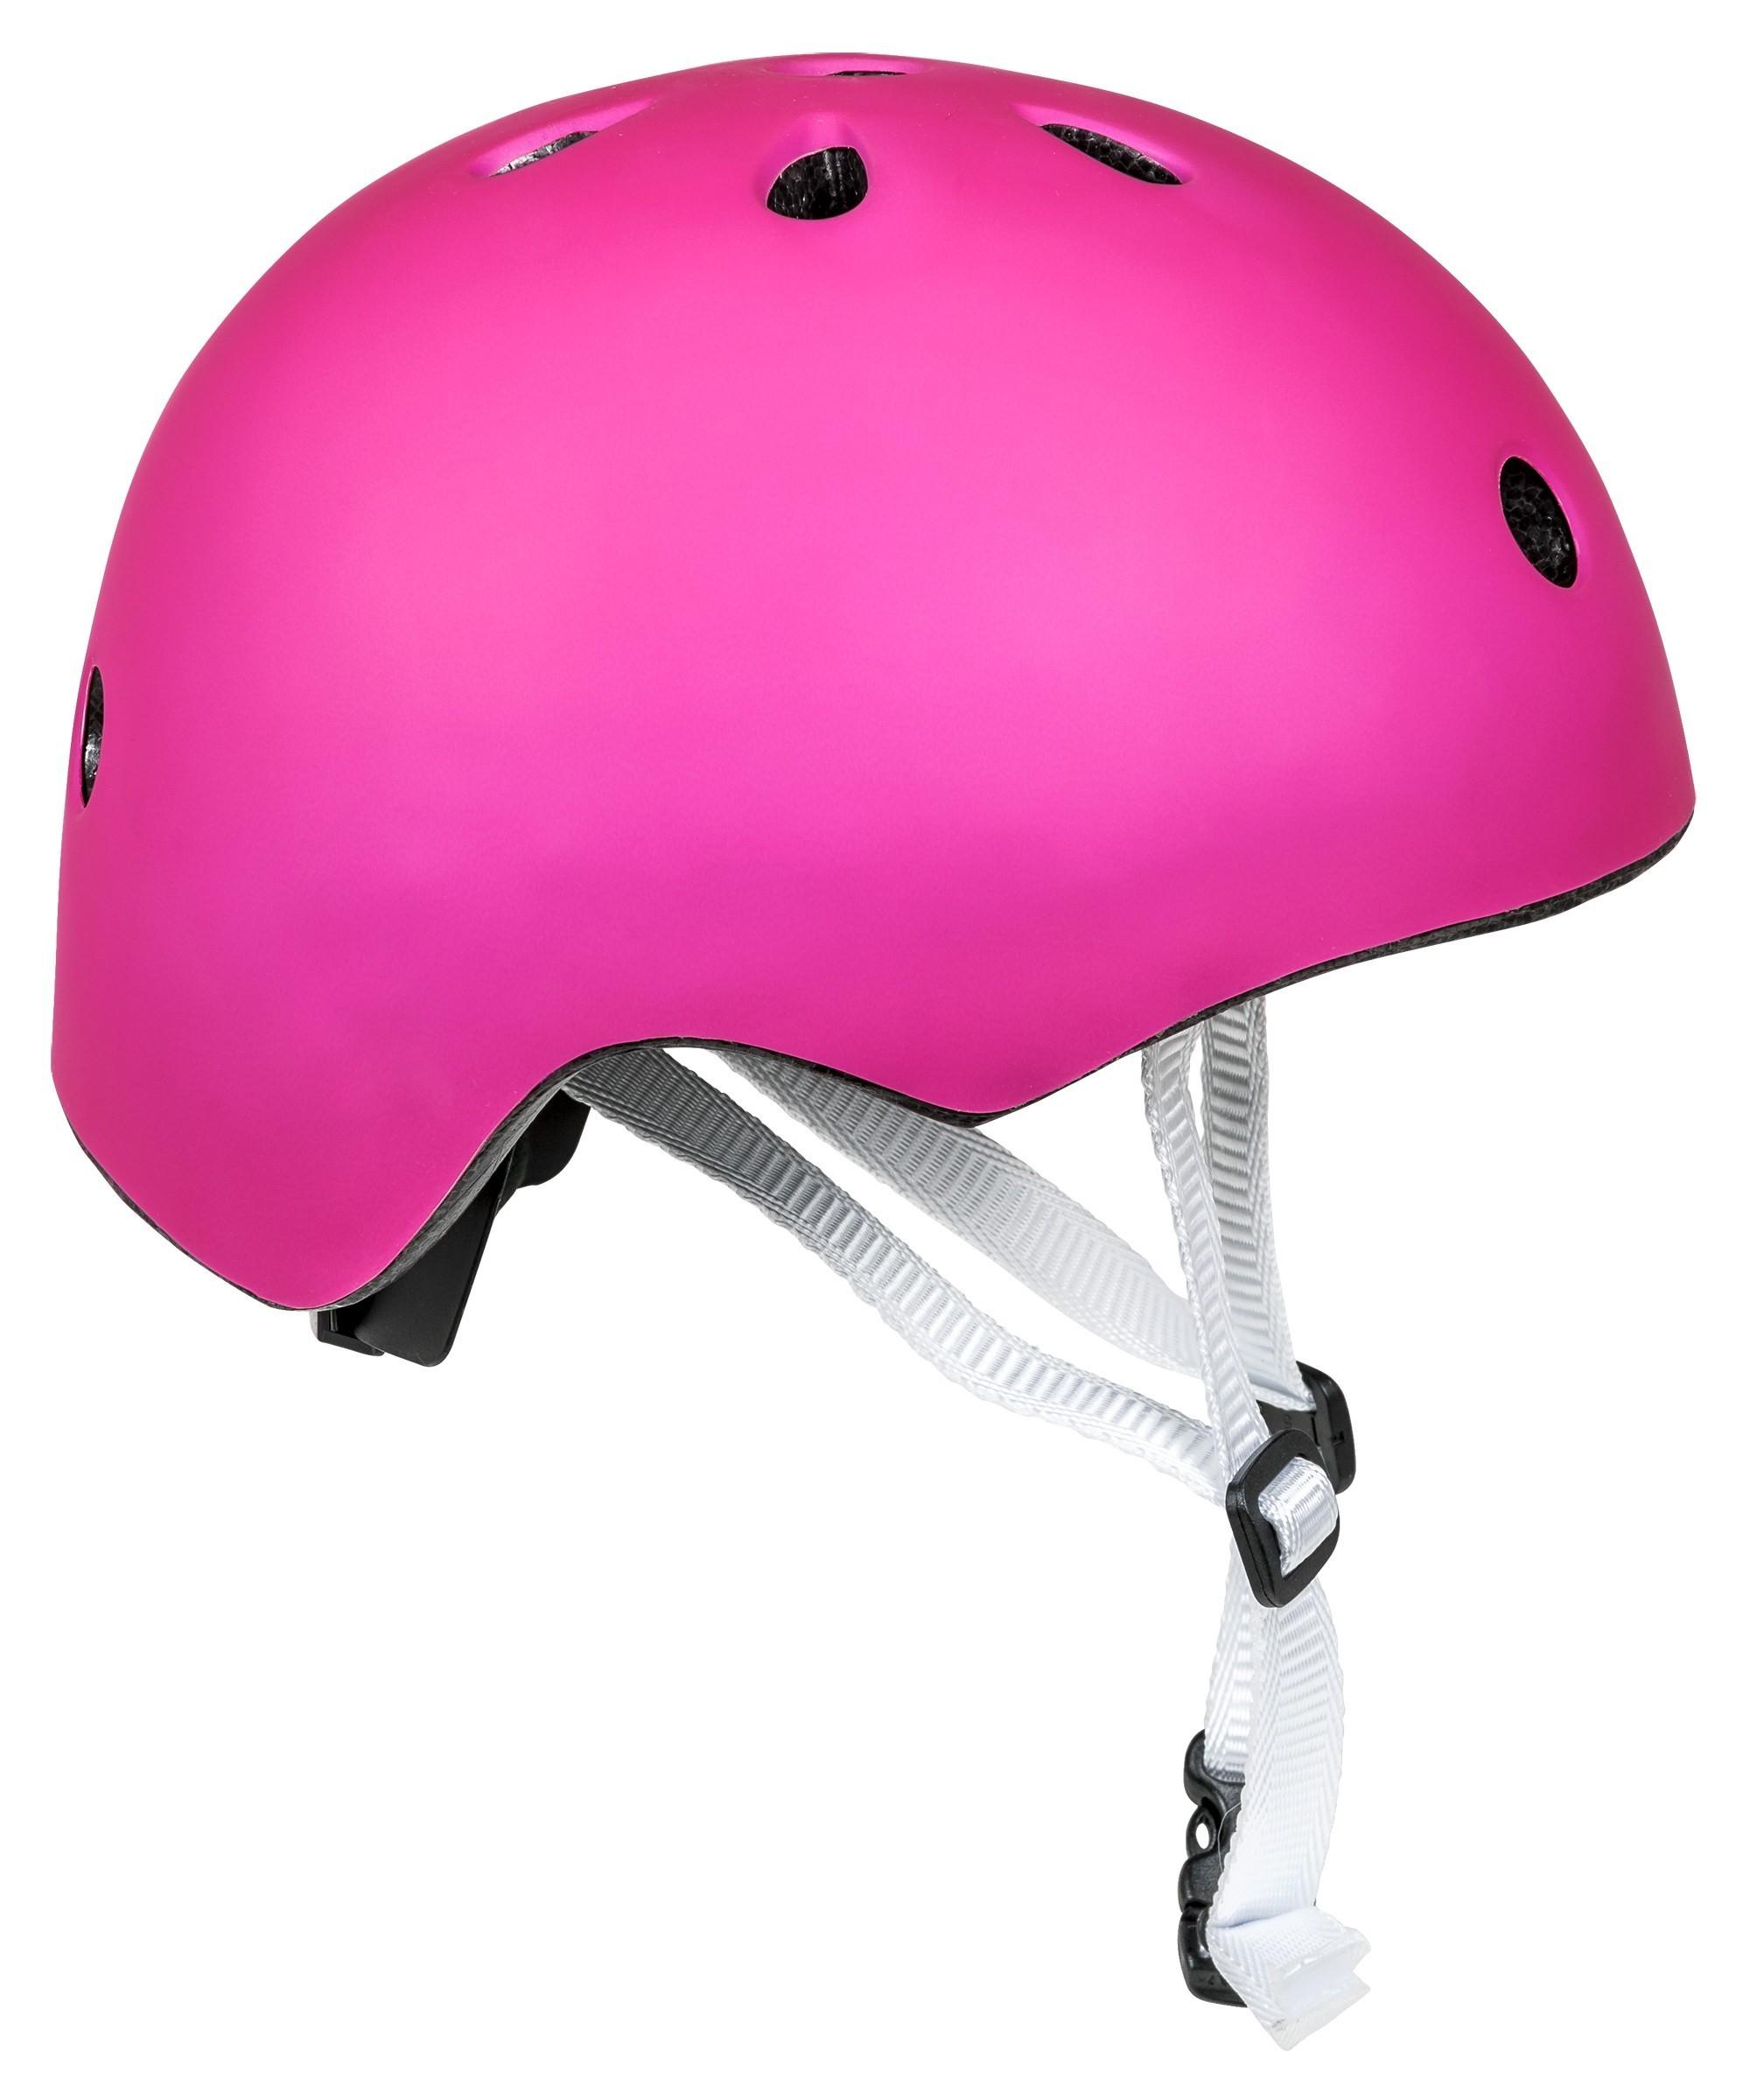 Powerslide Kinder Helm RosaPowerslide Kinder Helm Rosa